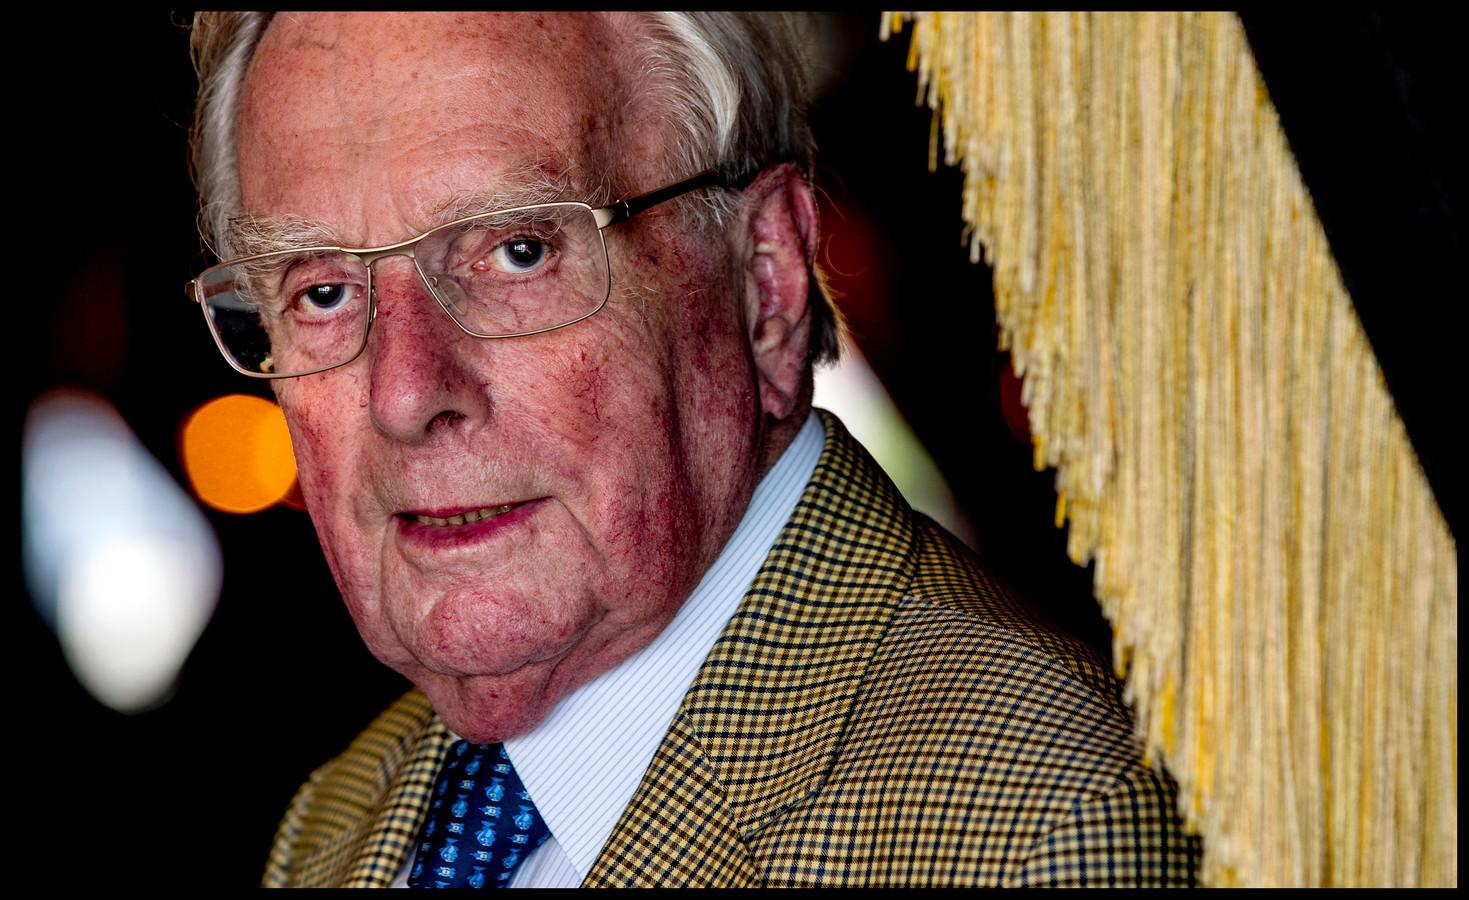 Frits Korthals Altes, minister van Staat en prominent lid van de VVD.